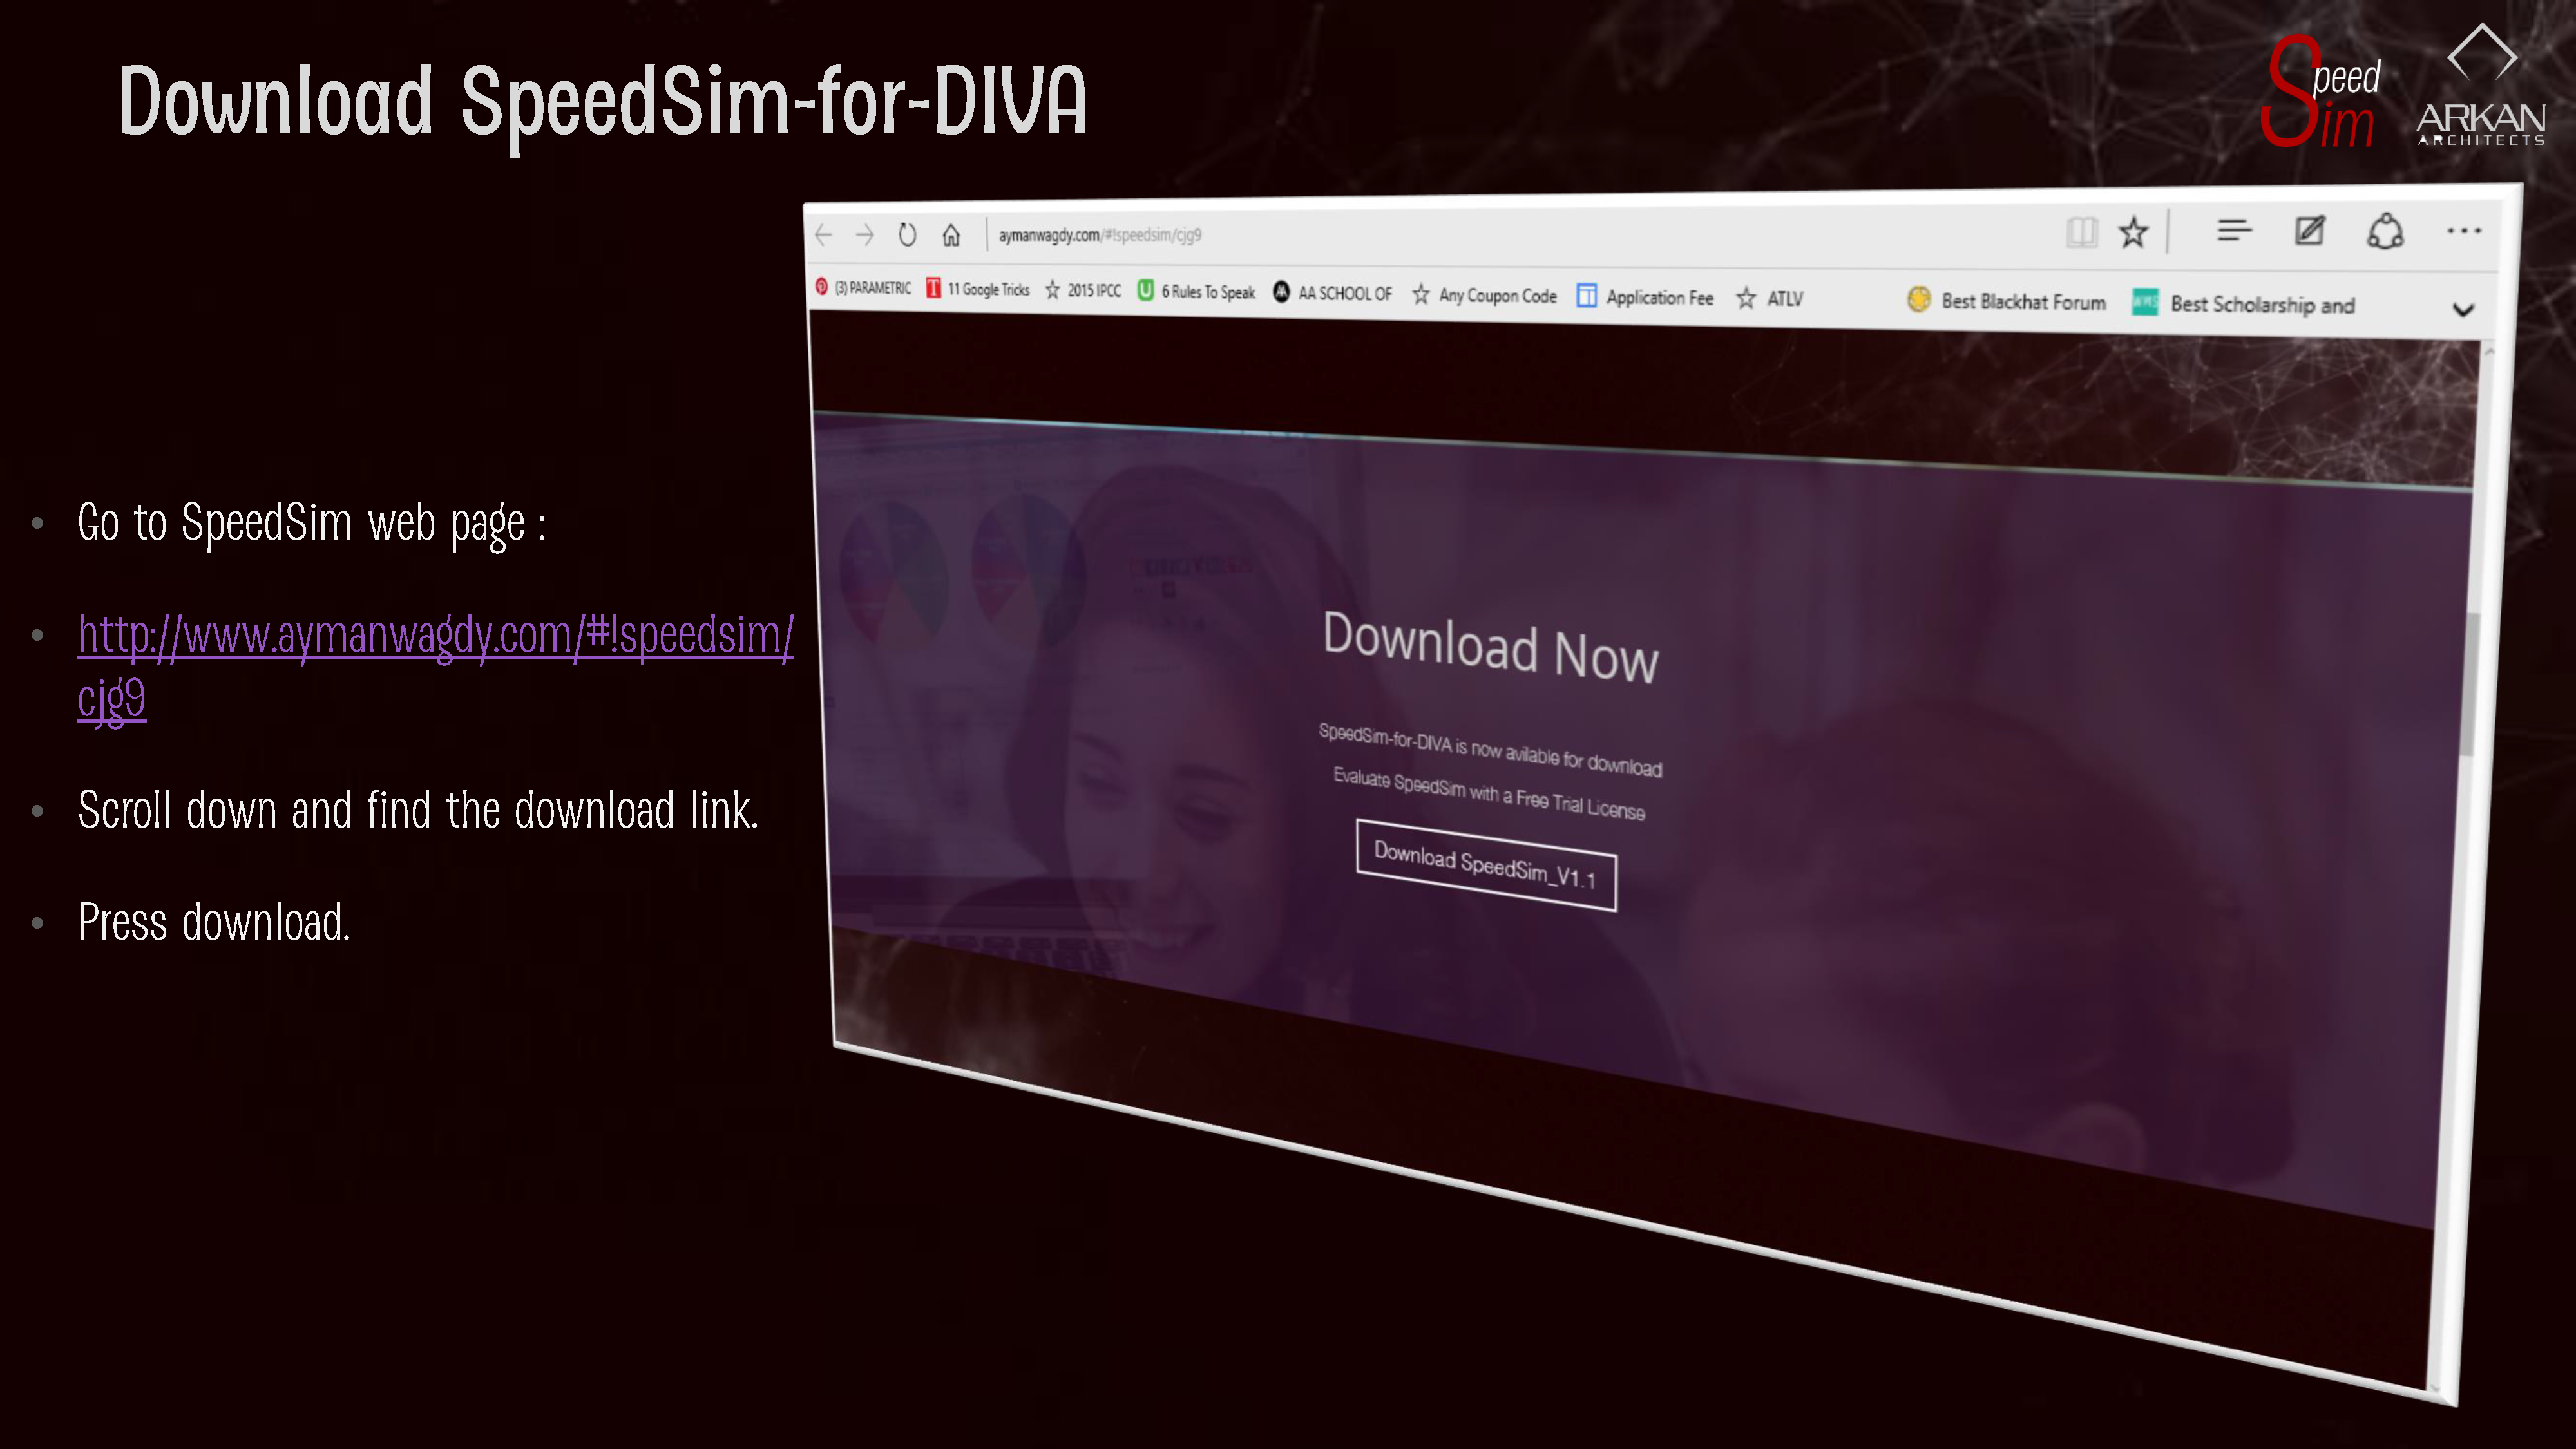 Download SpeedSim-for-DIVA